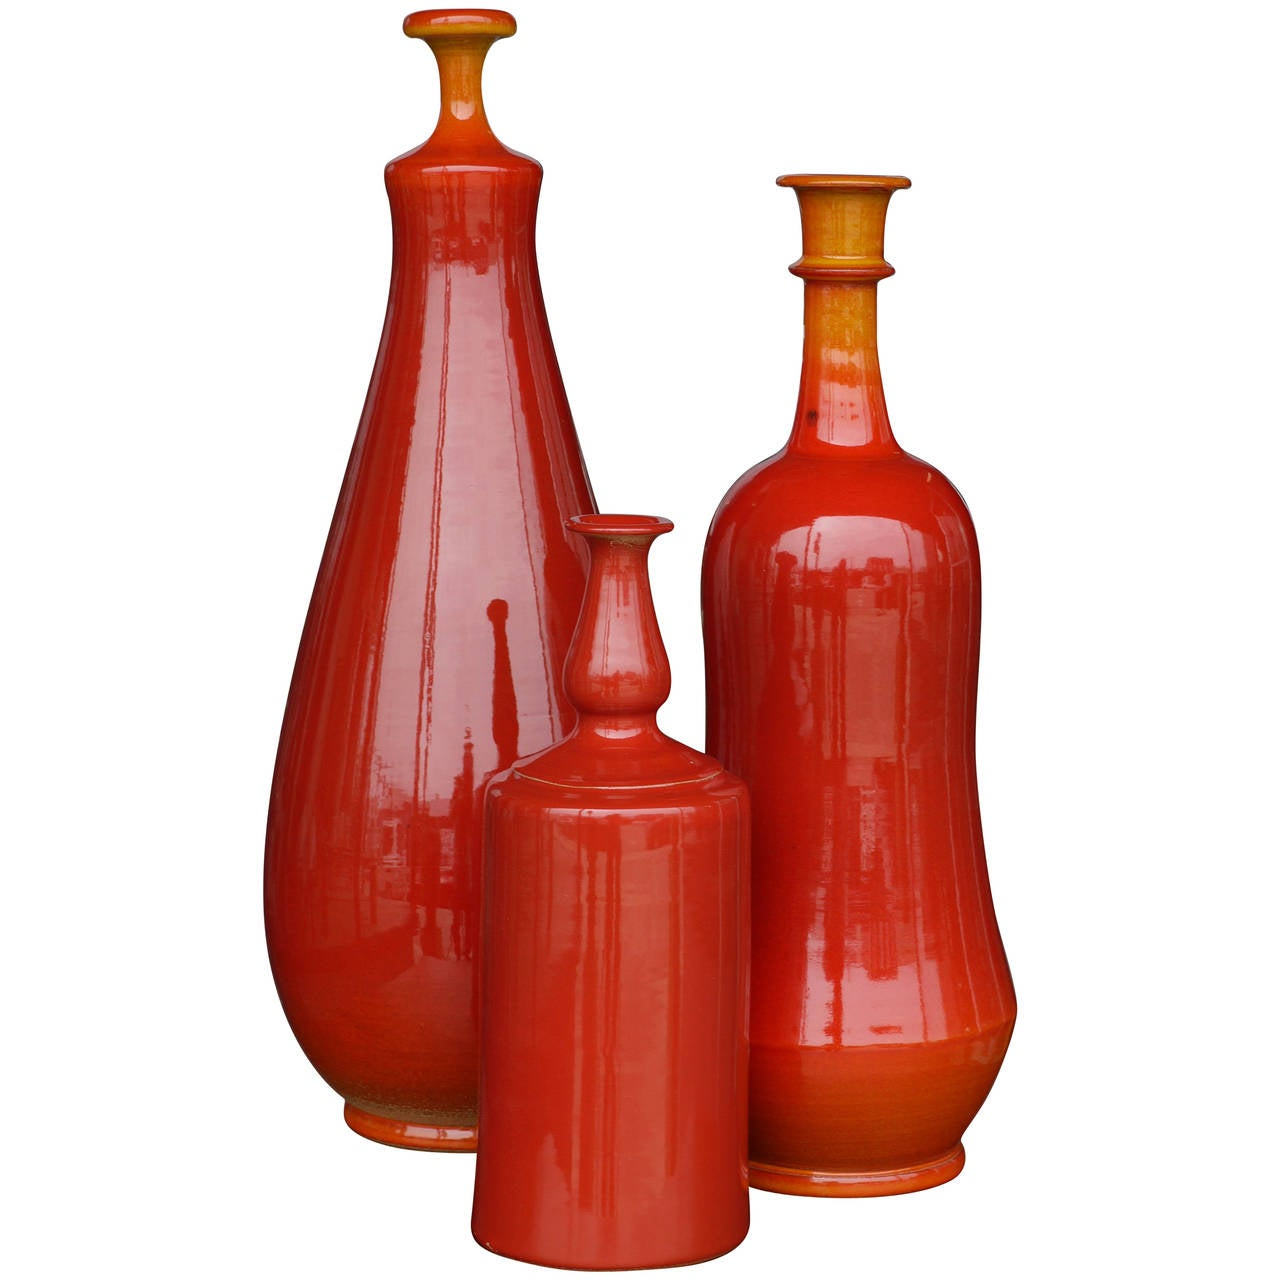 Vibrant Grouping of Italian Ceramic Vases